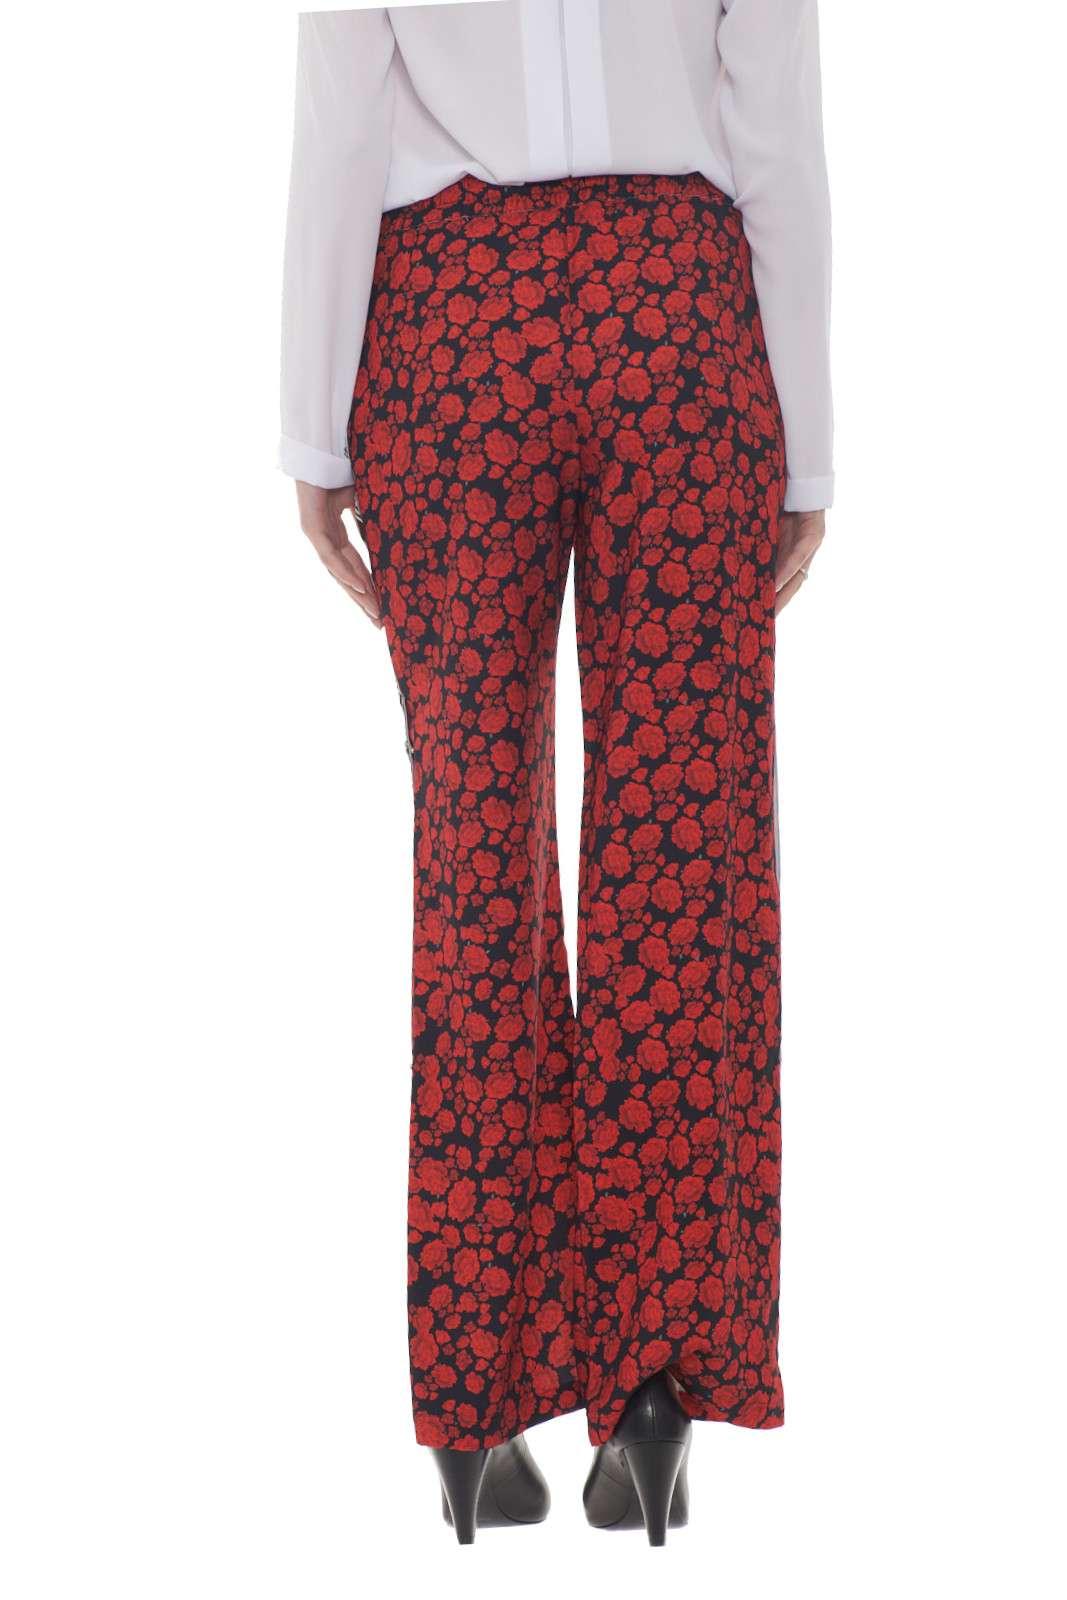 https://www.parmax.com/media/catalog/product/a/i/AI-outlet_parmax-pantaloni-donna-SH-Collection-17102019-C.jpg